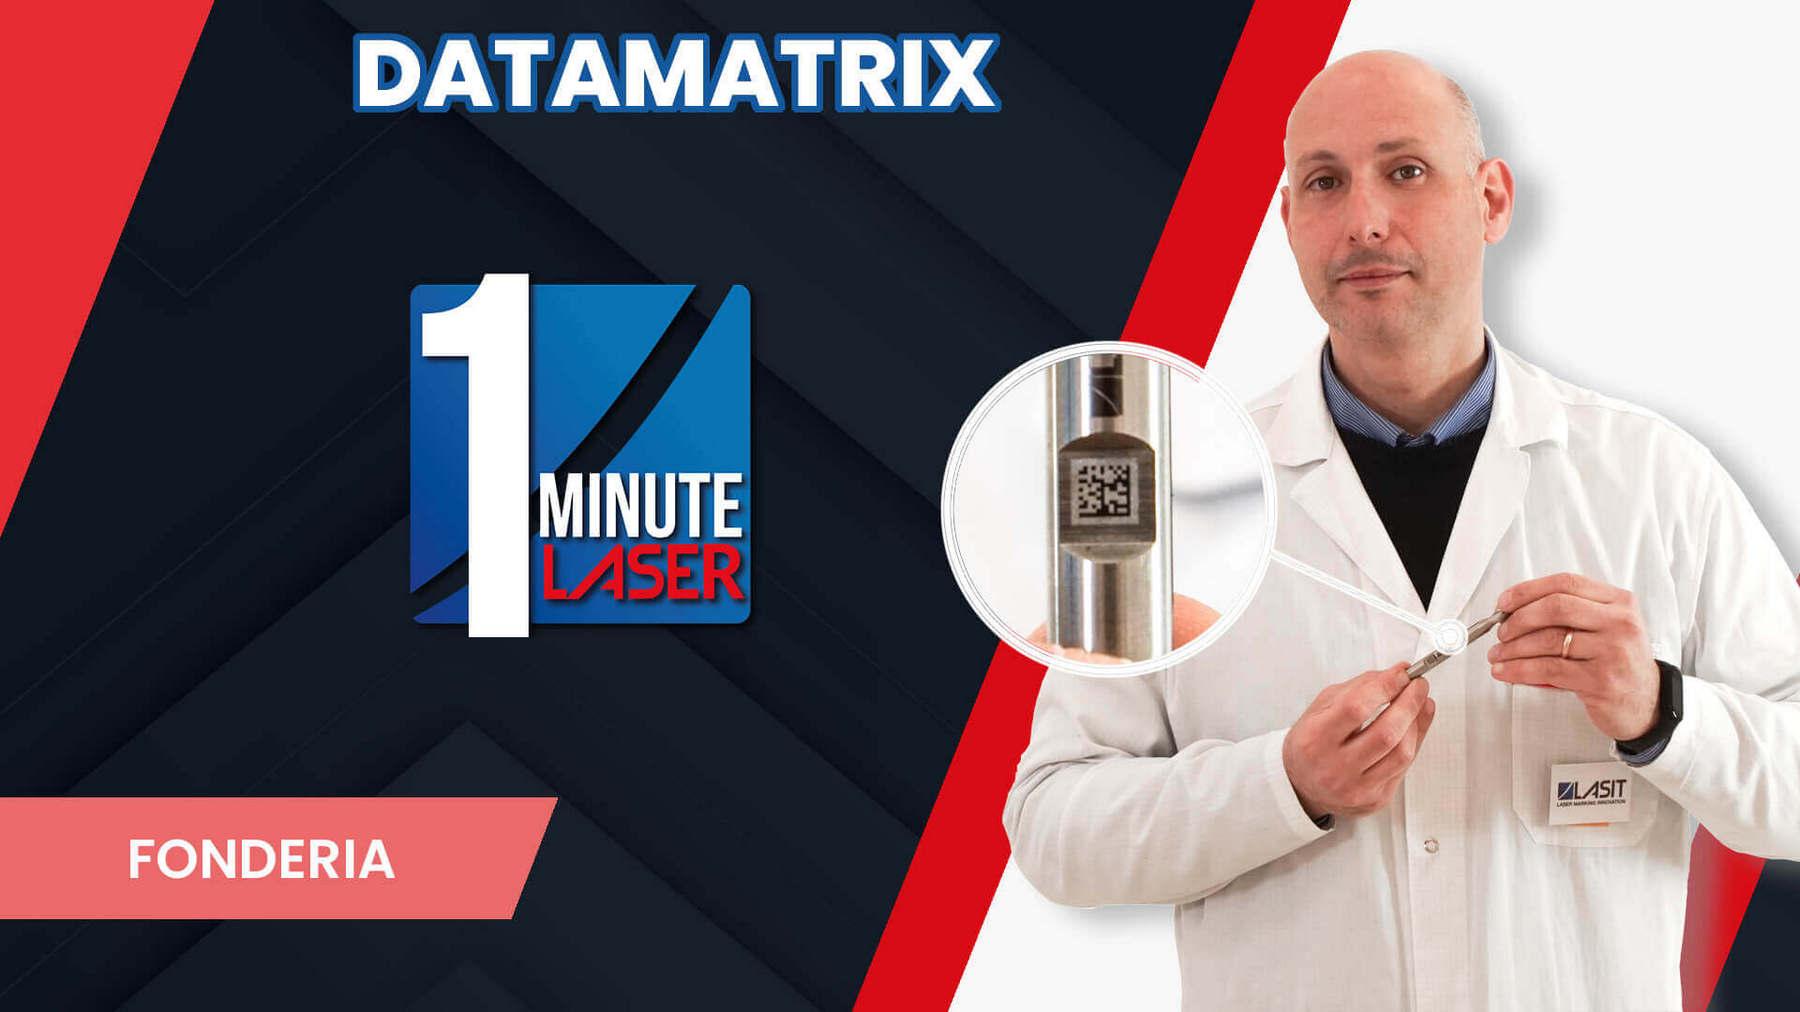 Copertina_One-Minute-Lasere-3-Datamatrix_COPERTINA Fonderia